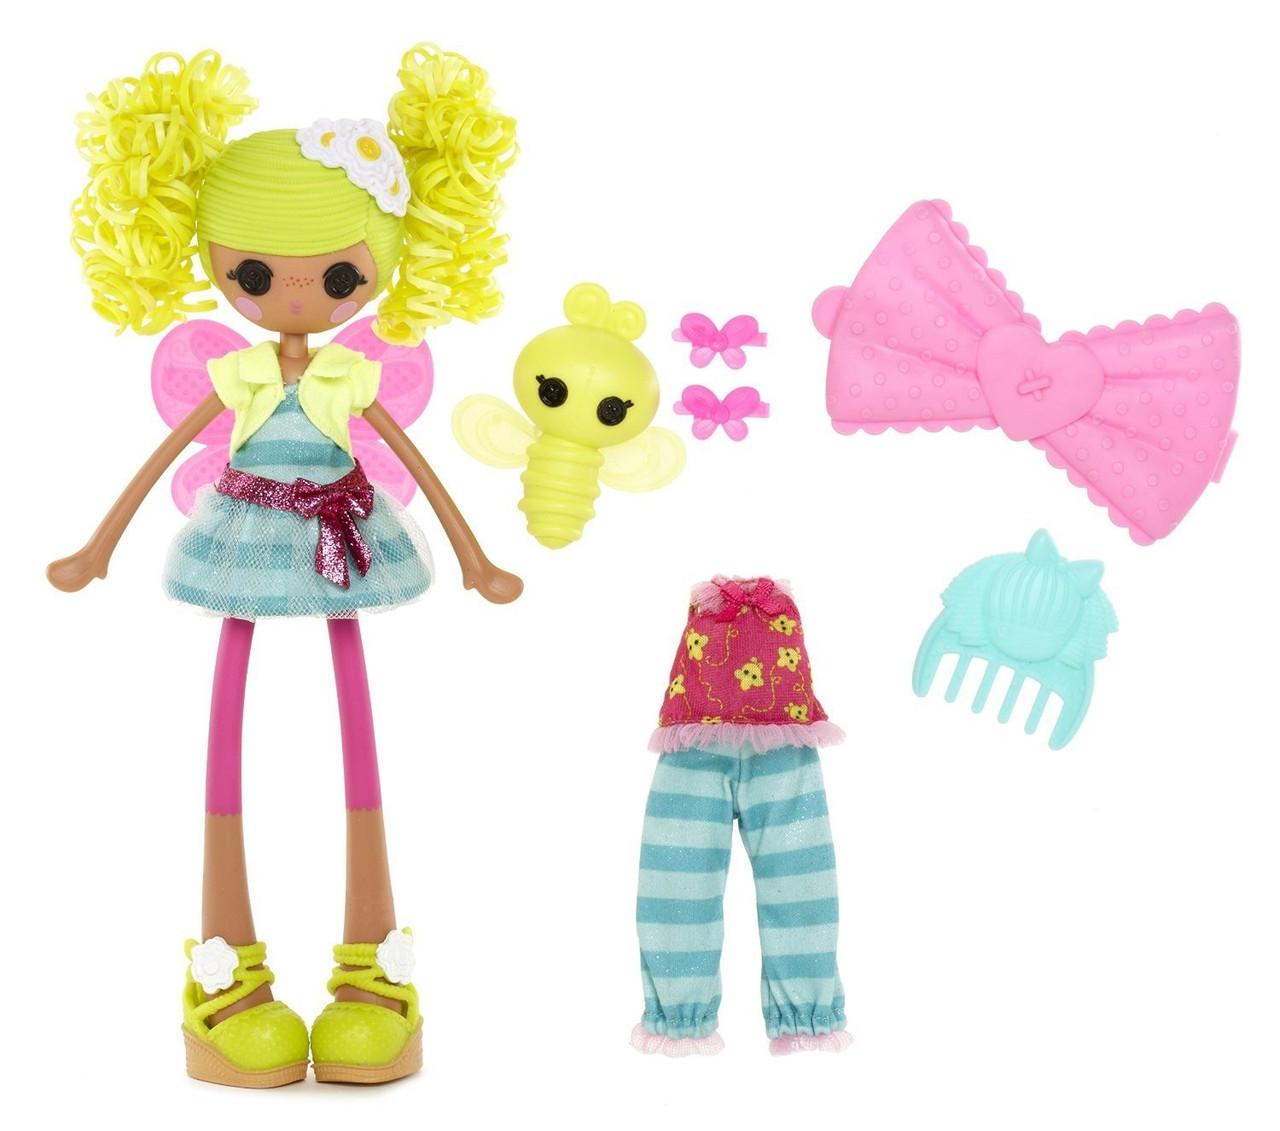 Lalaloopsy Кукла Лалалупси - Цветочная фея 25 см